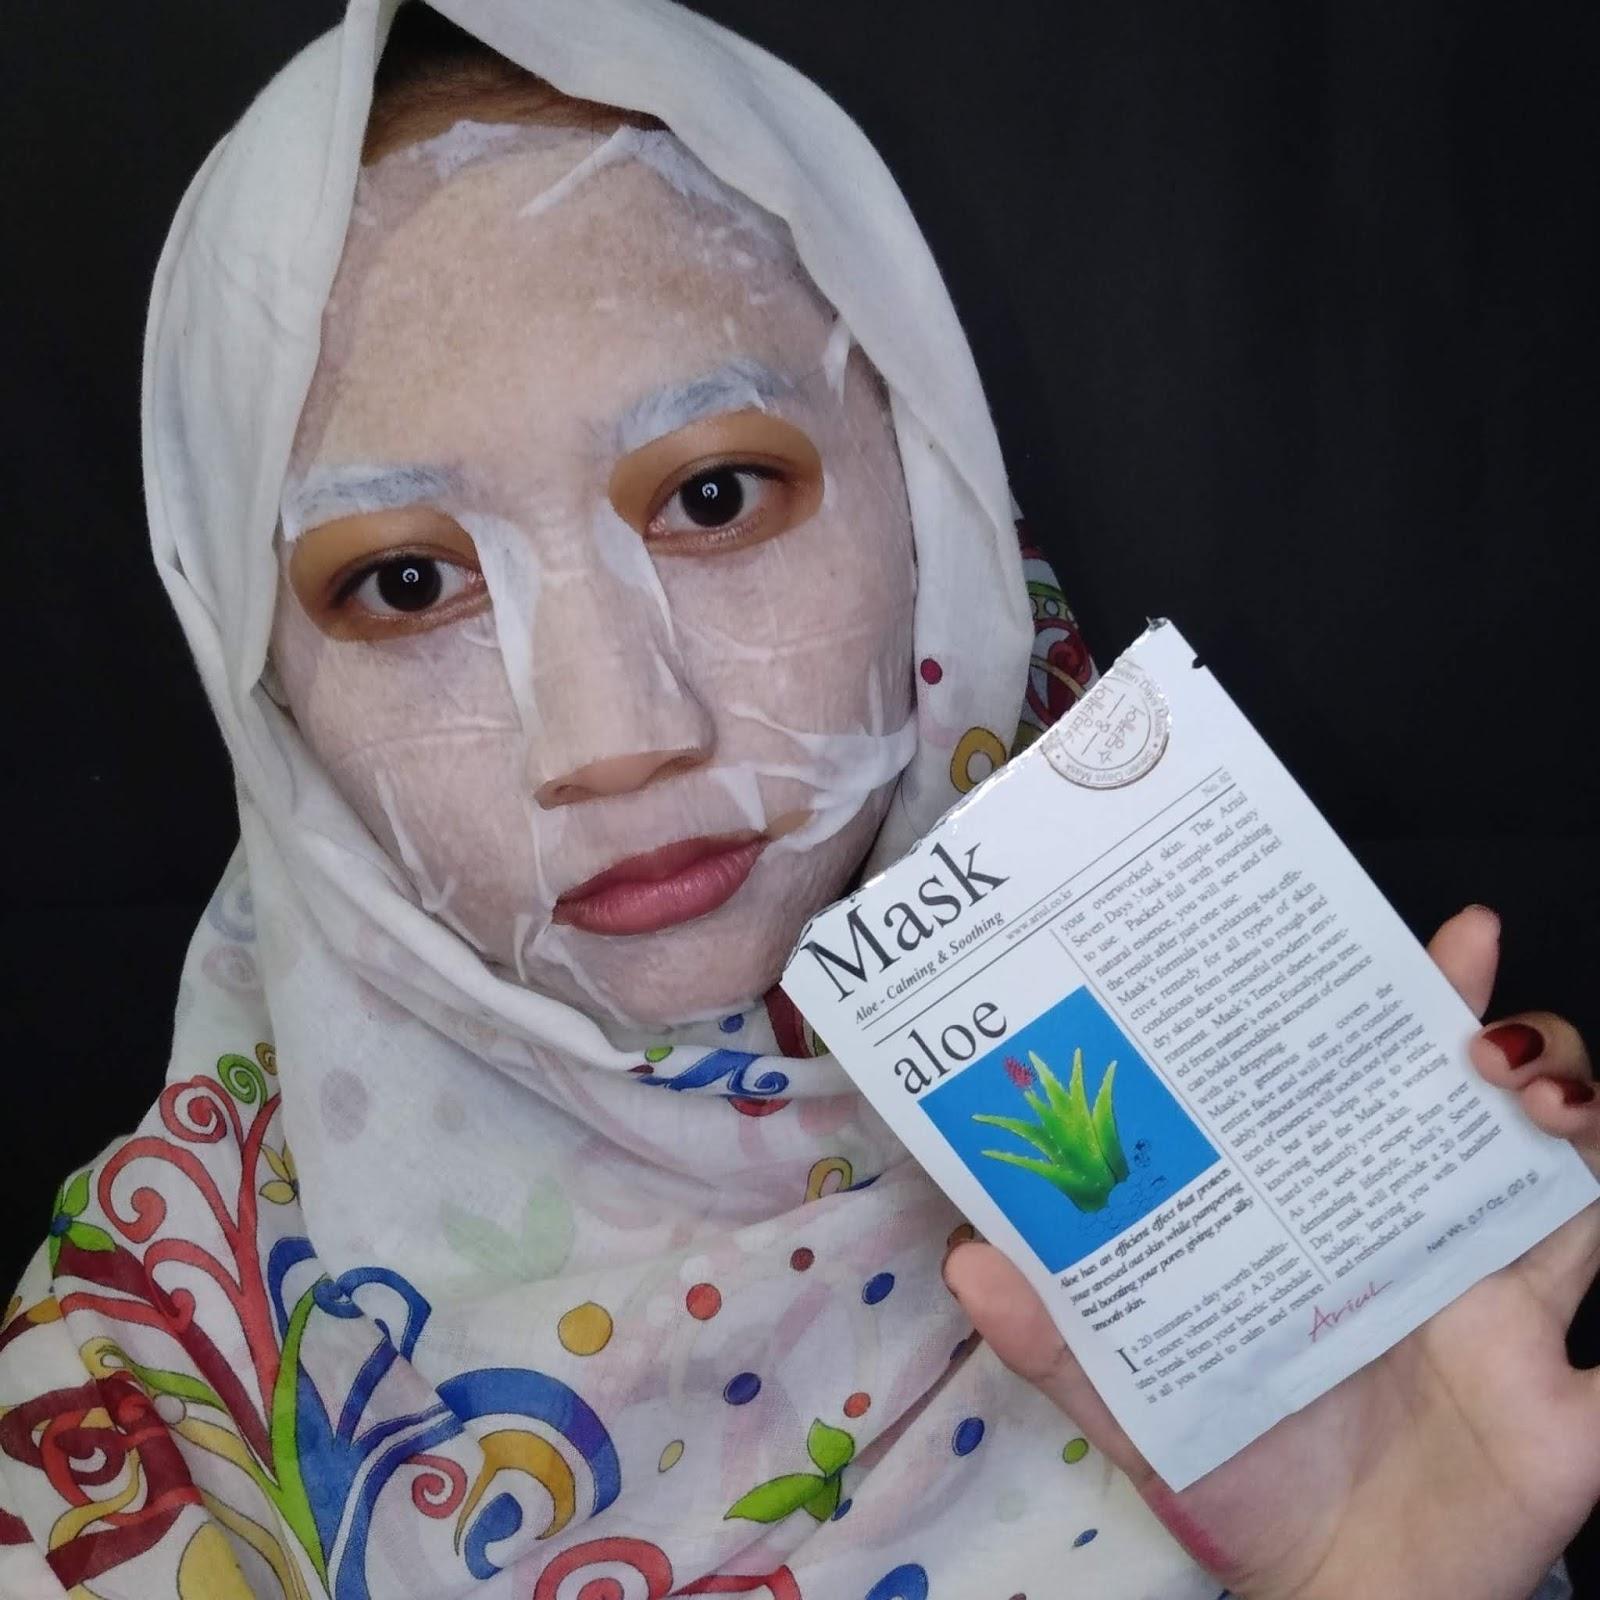 7 Days Sheet Mask Challenge Day 1